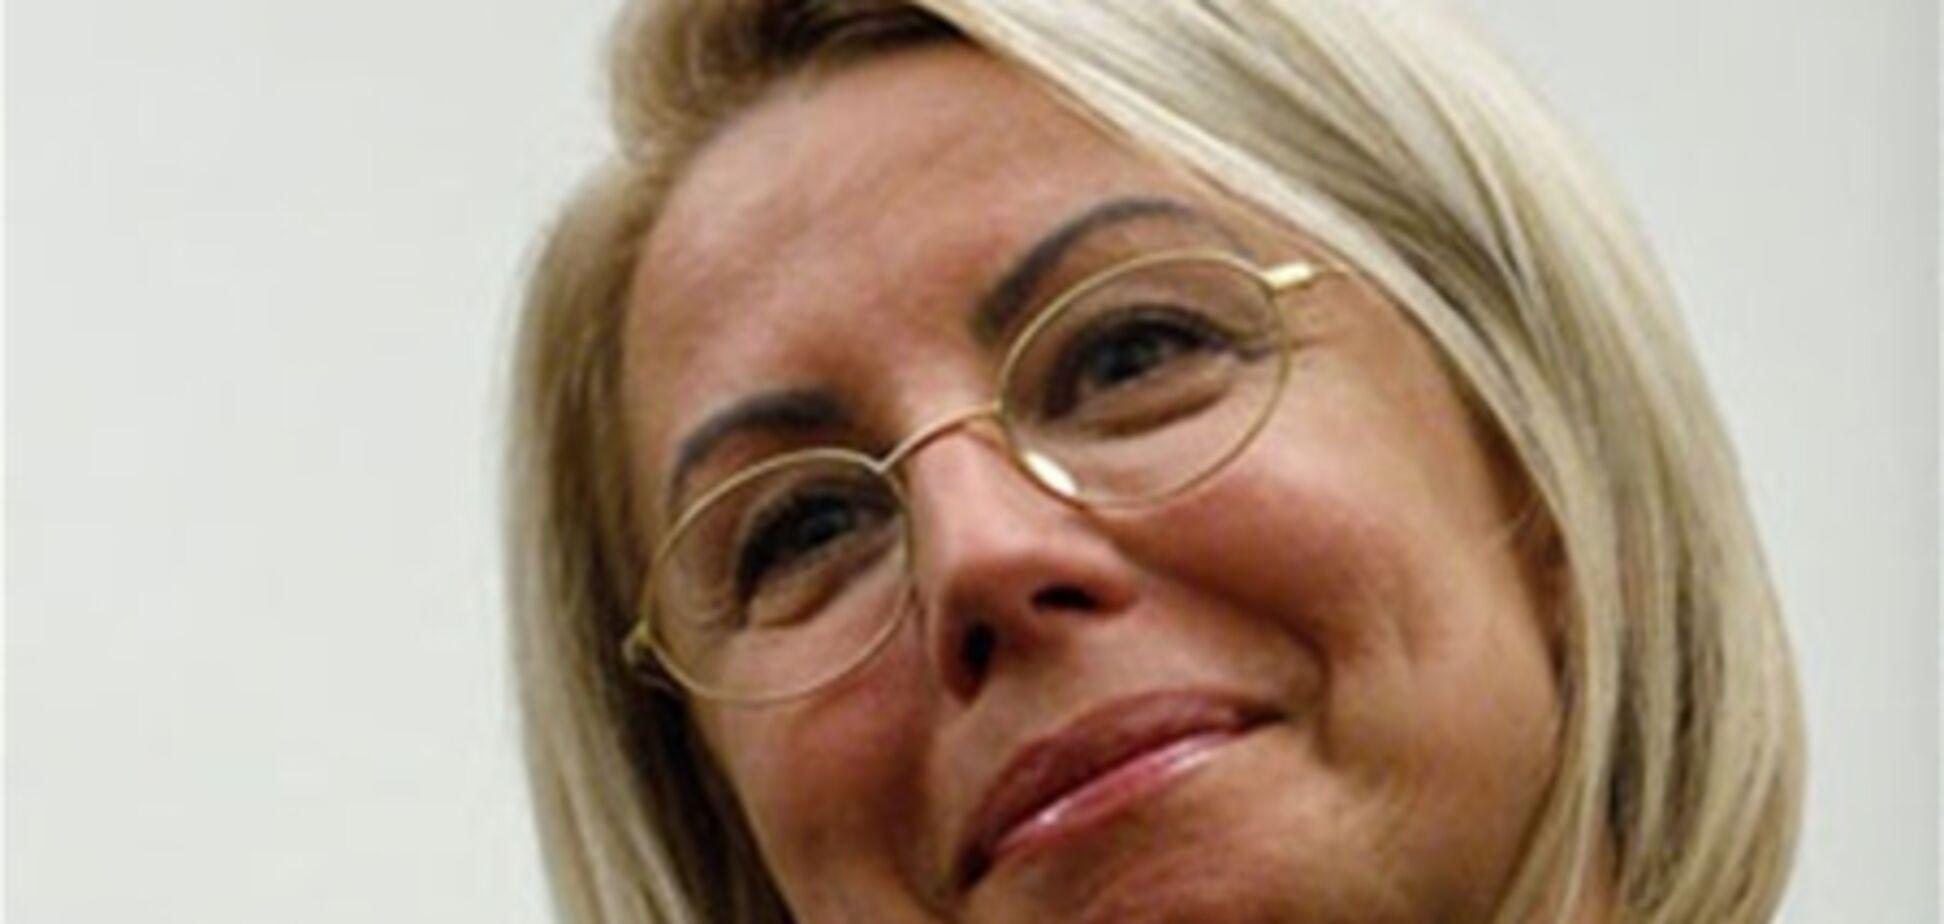 Герман одобрила кандидатуру 'главного по свободе слова'